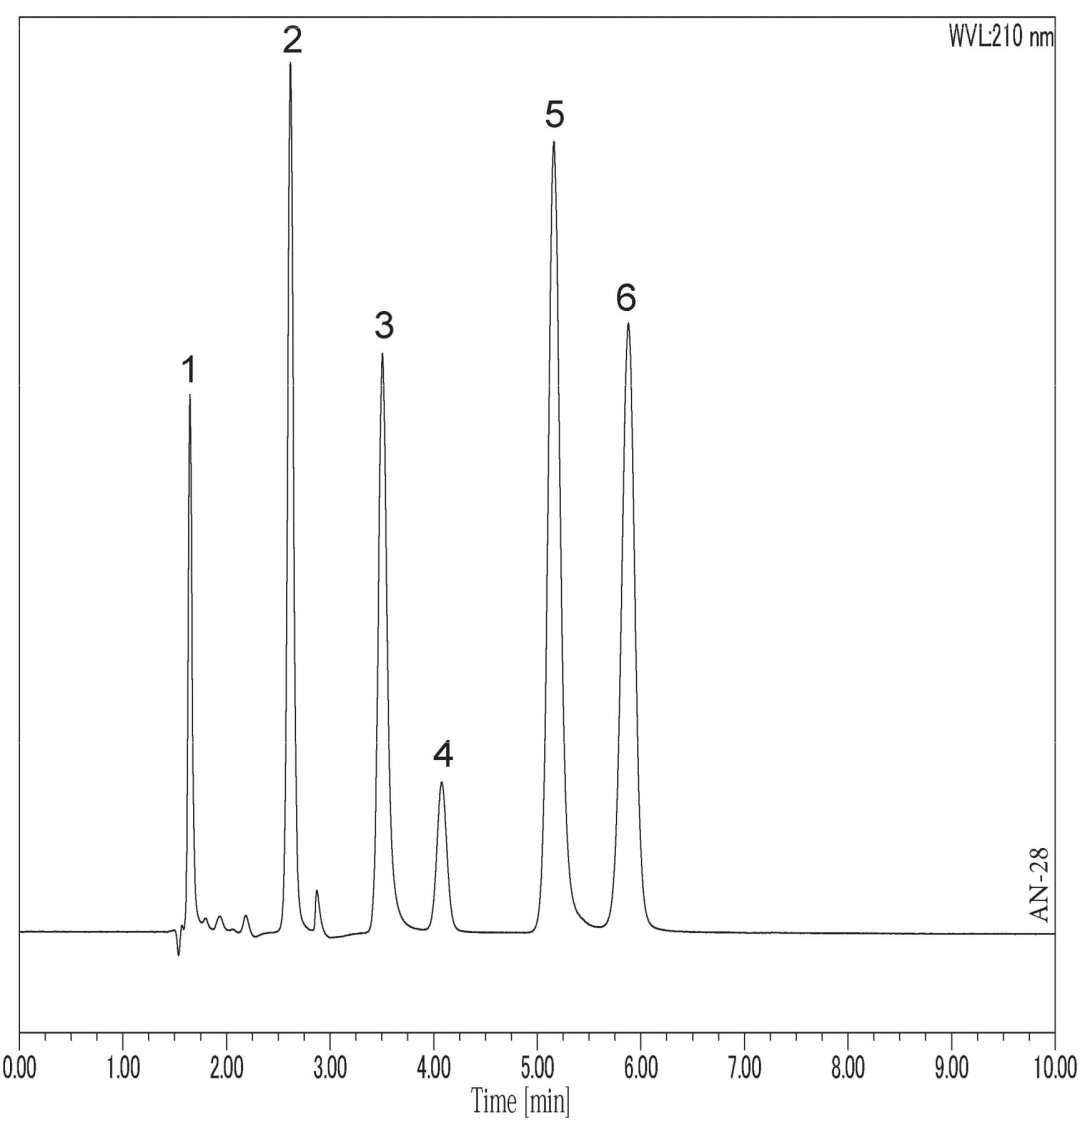 Analysis of 6 Acid Compounds using HPLC-UV